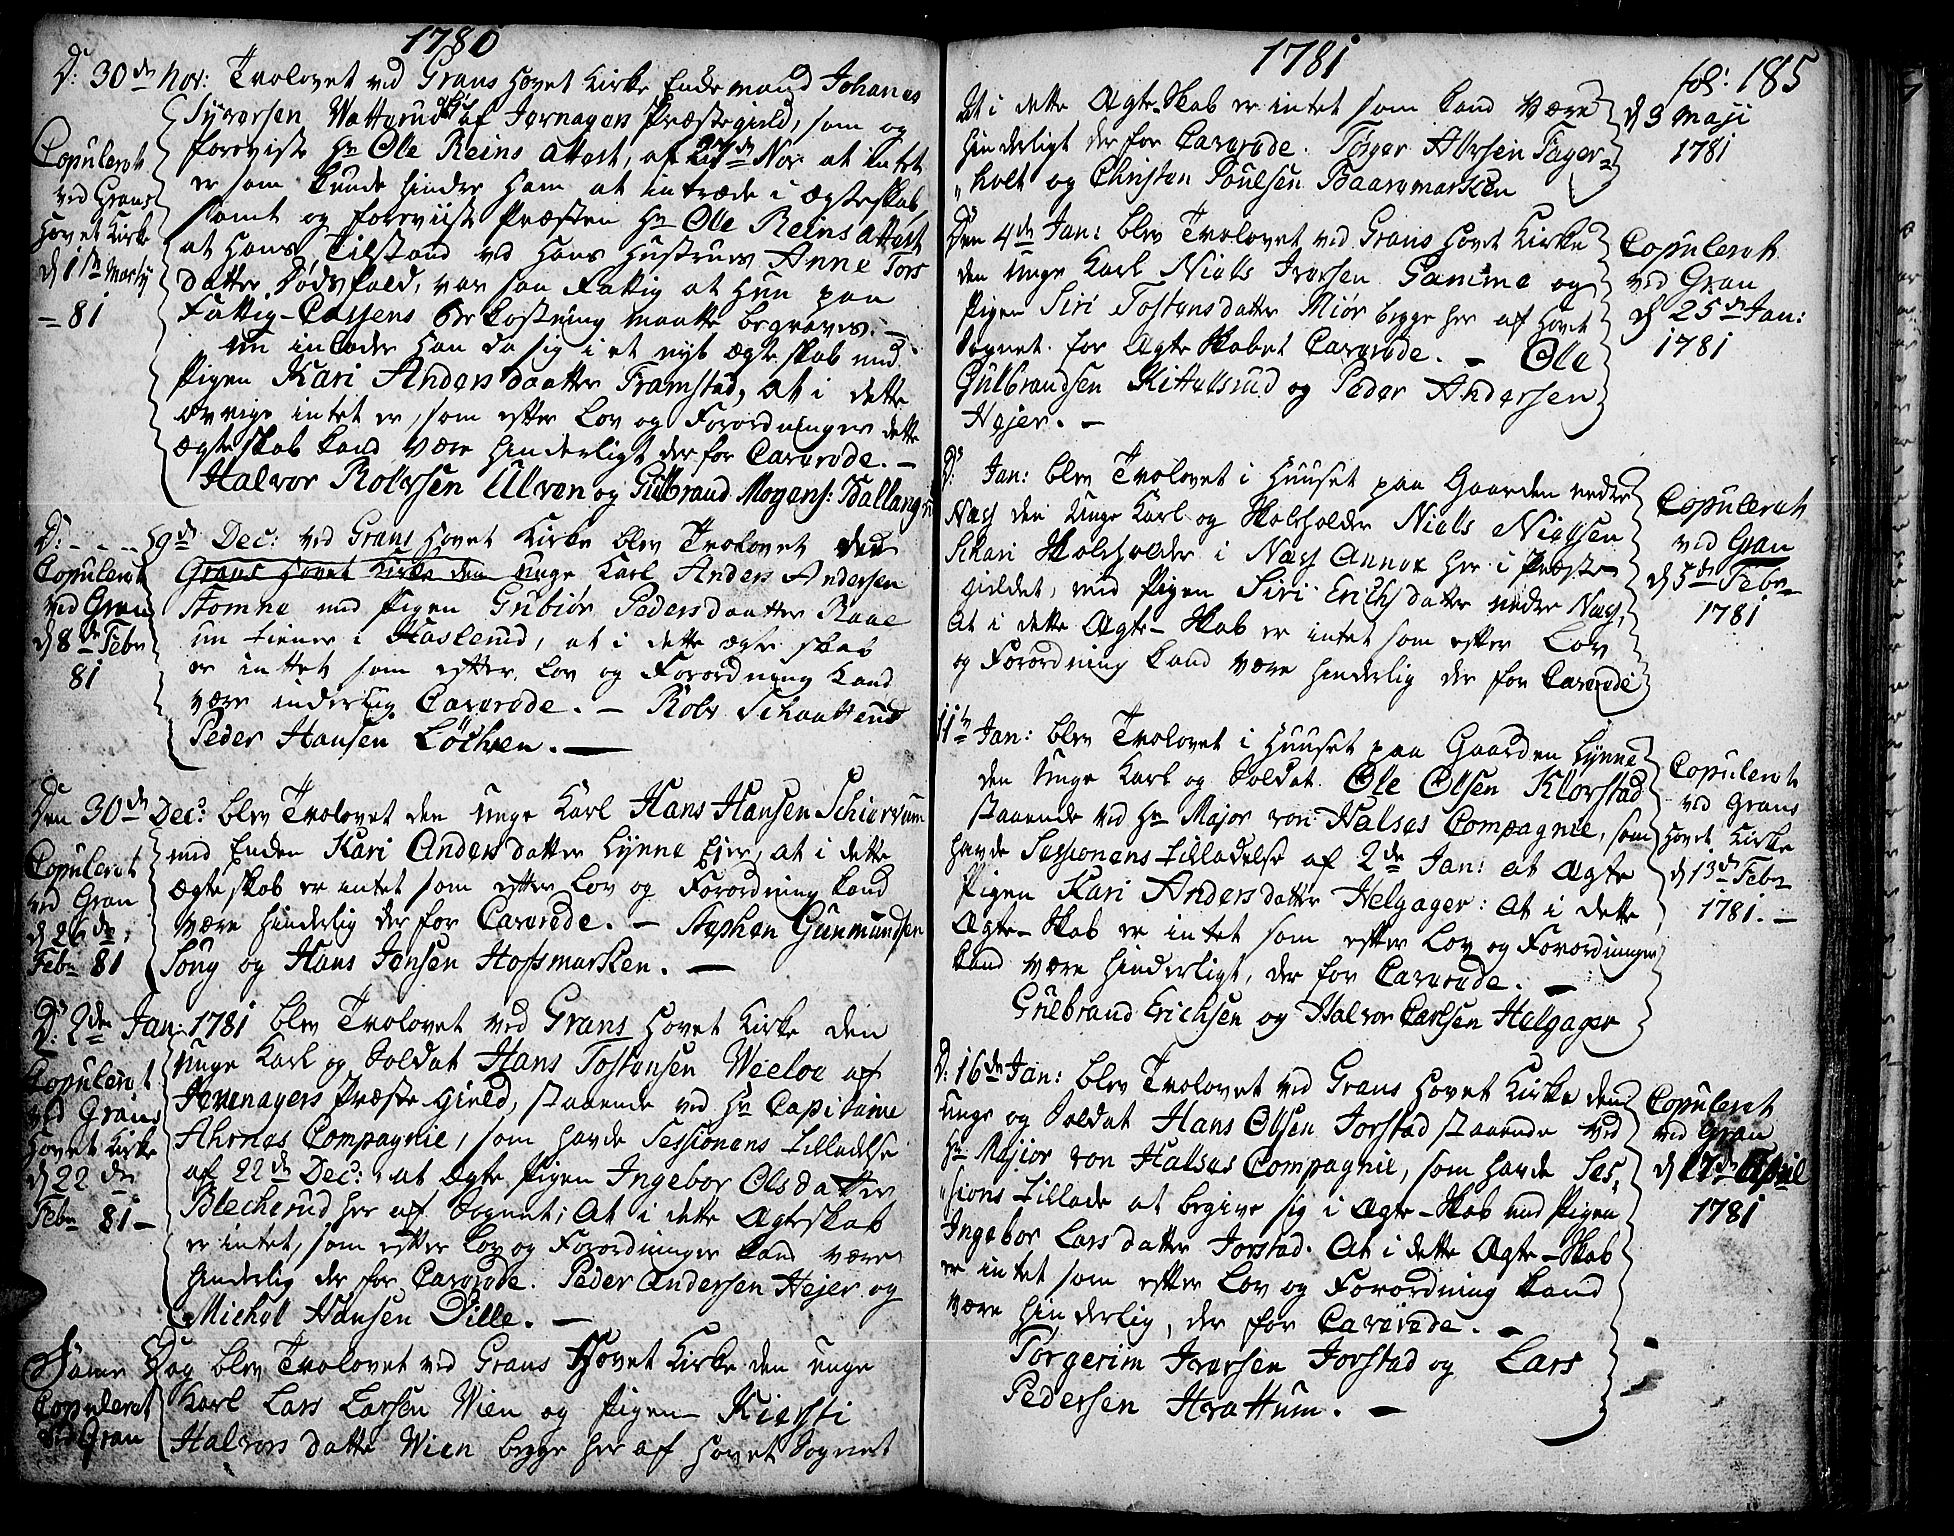 SAH, Gran prestekontor, Ministerialbok nr. 5, 1776-1788, s. 185